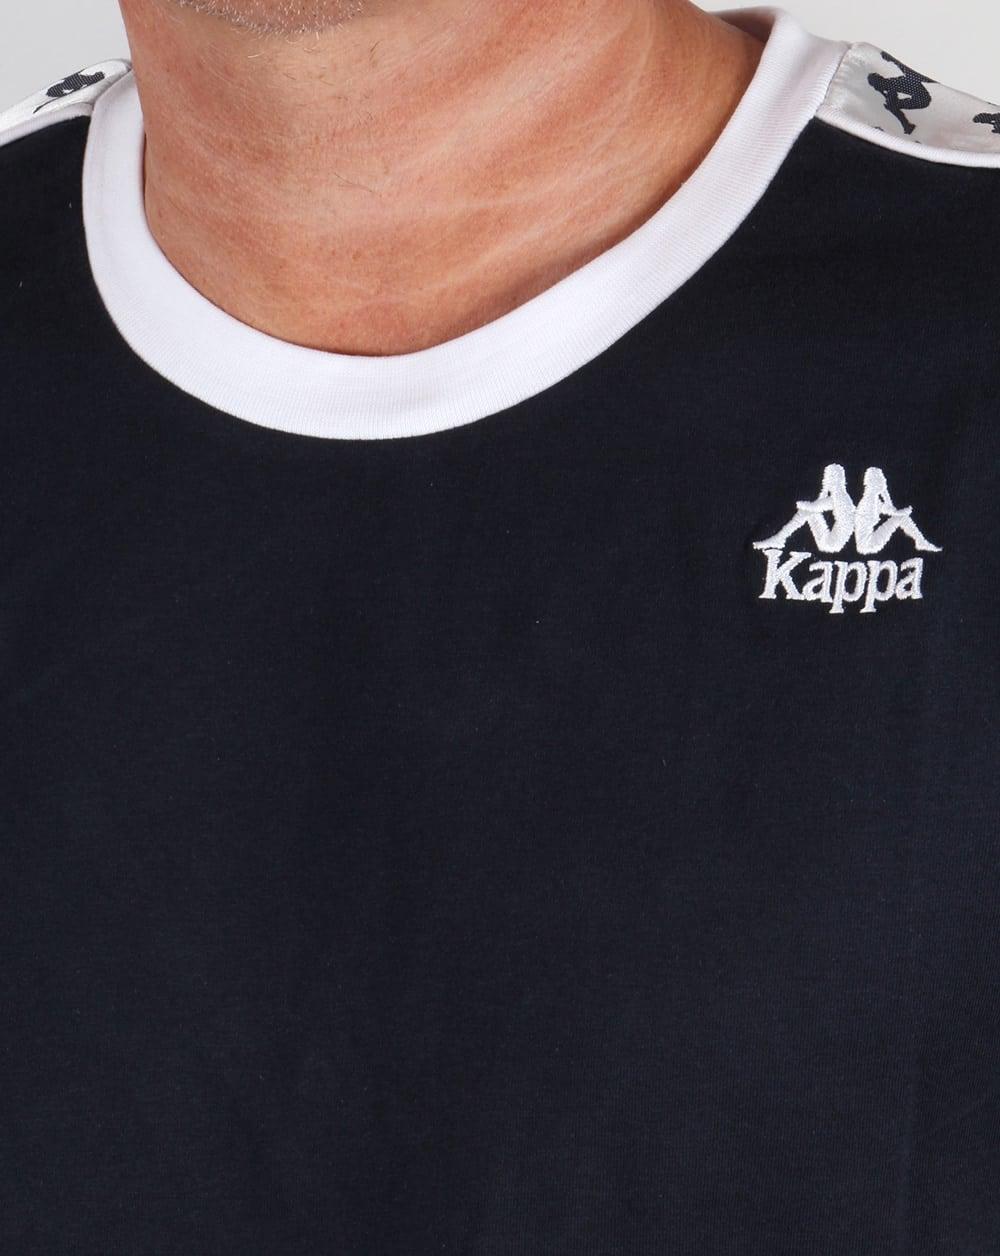 Robe Di Kappa Logo Ringer Taping T Shirt Navyteeretromens Circuit Board Tshirts Men39s Tshirt Navy